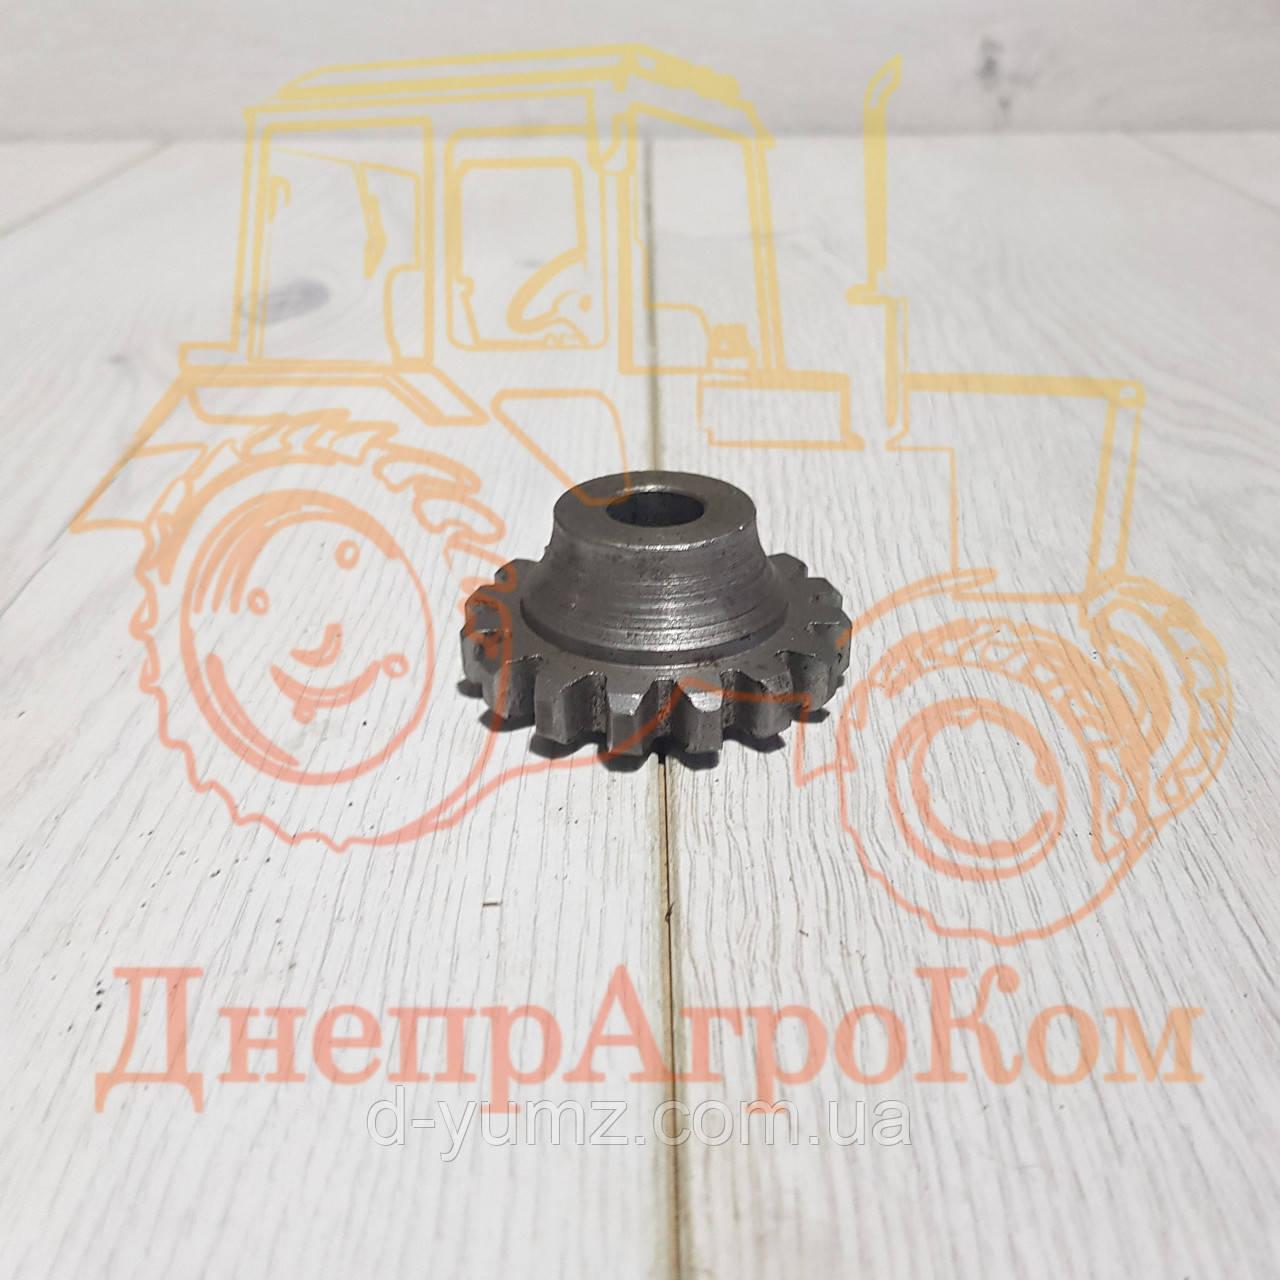 Шестерня редуктора ПД ЮМЗ Д-65 | Д25-075-Б